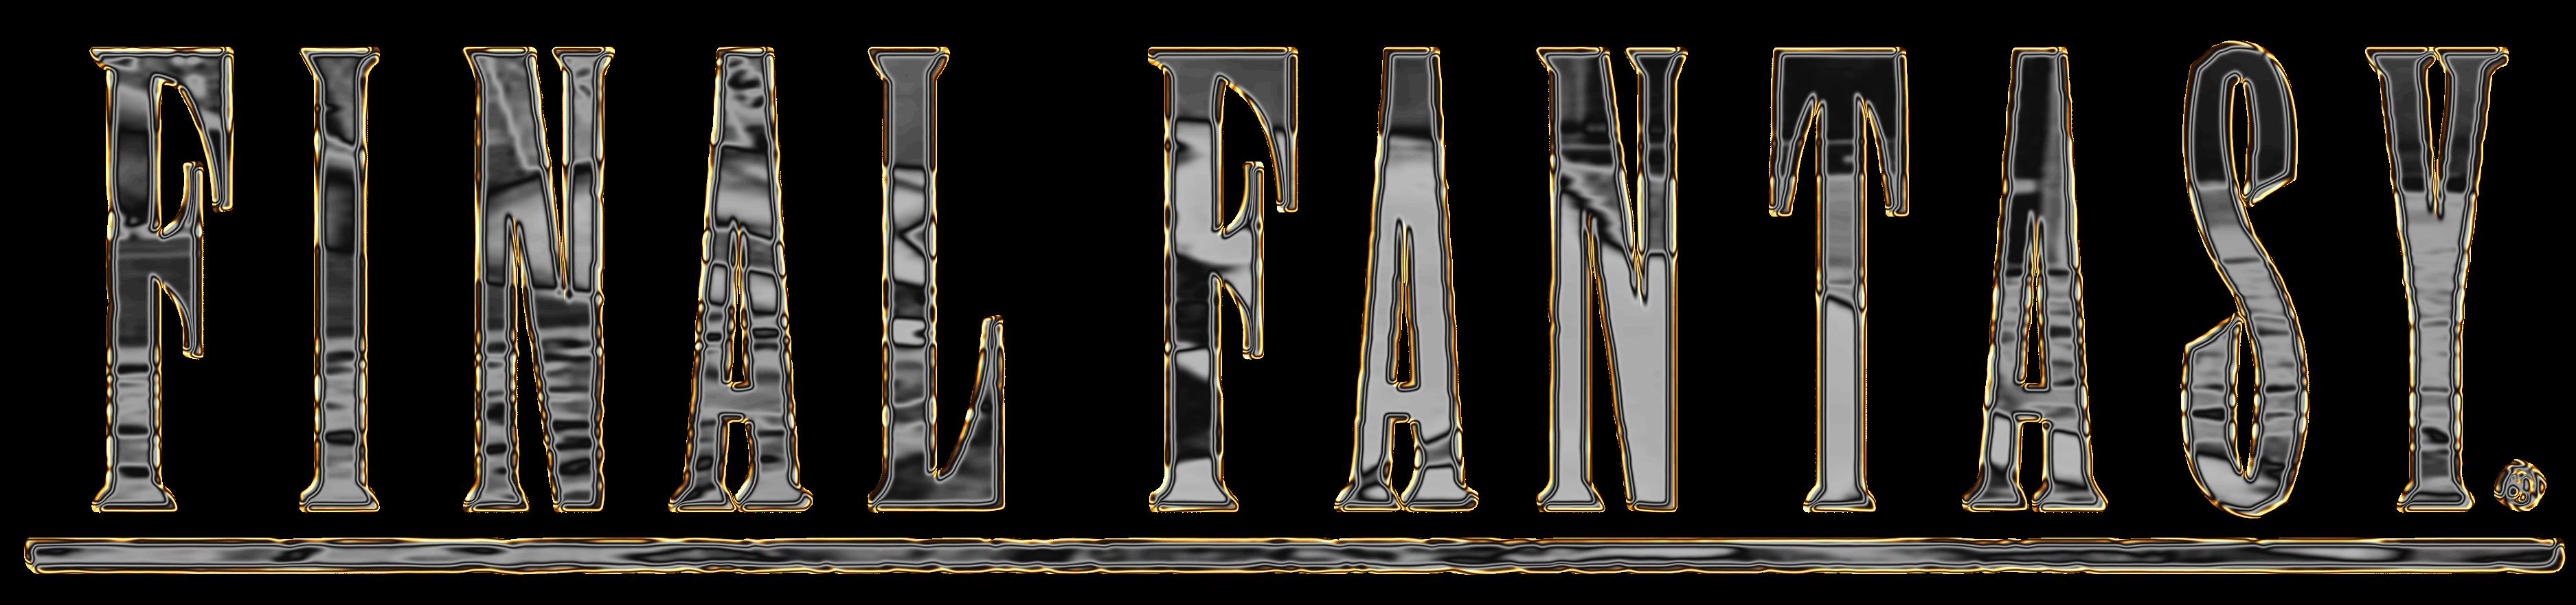 Final fantasy logo art - photo#41